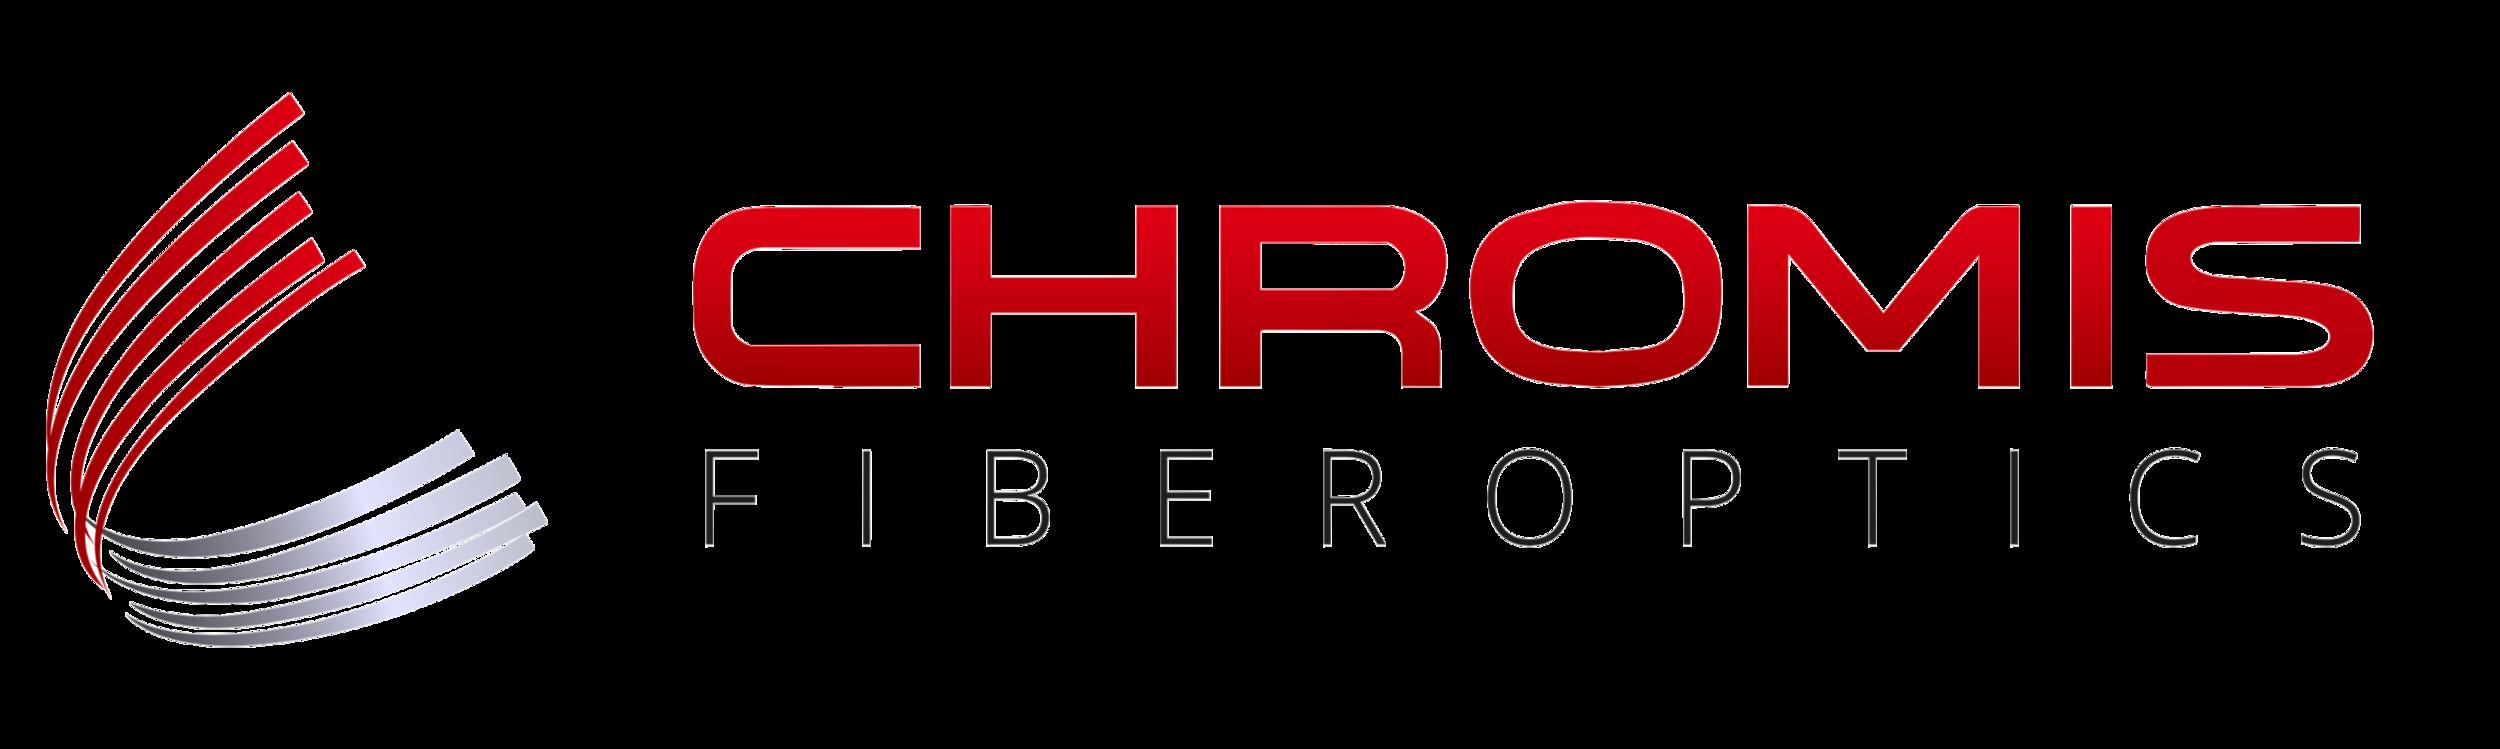 Chromis Logo.png